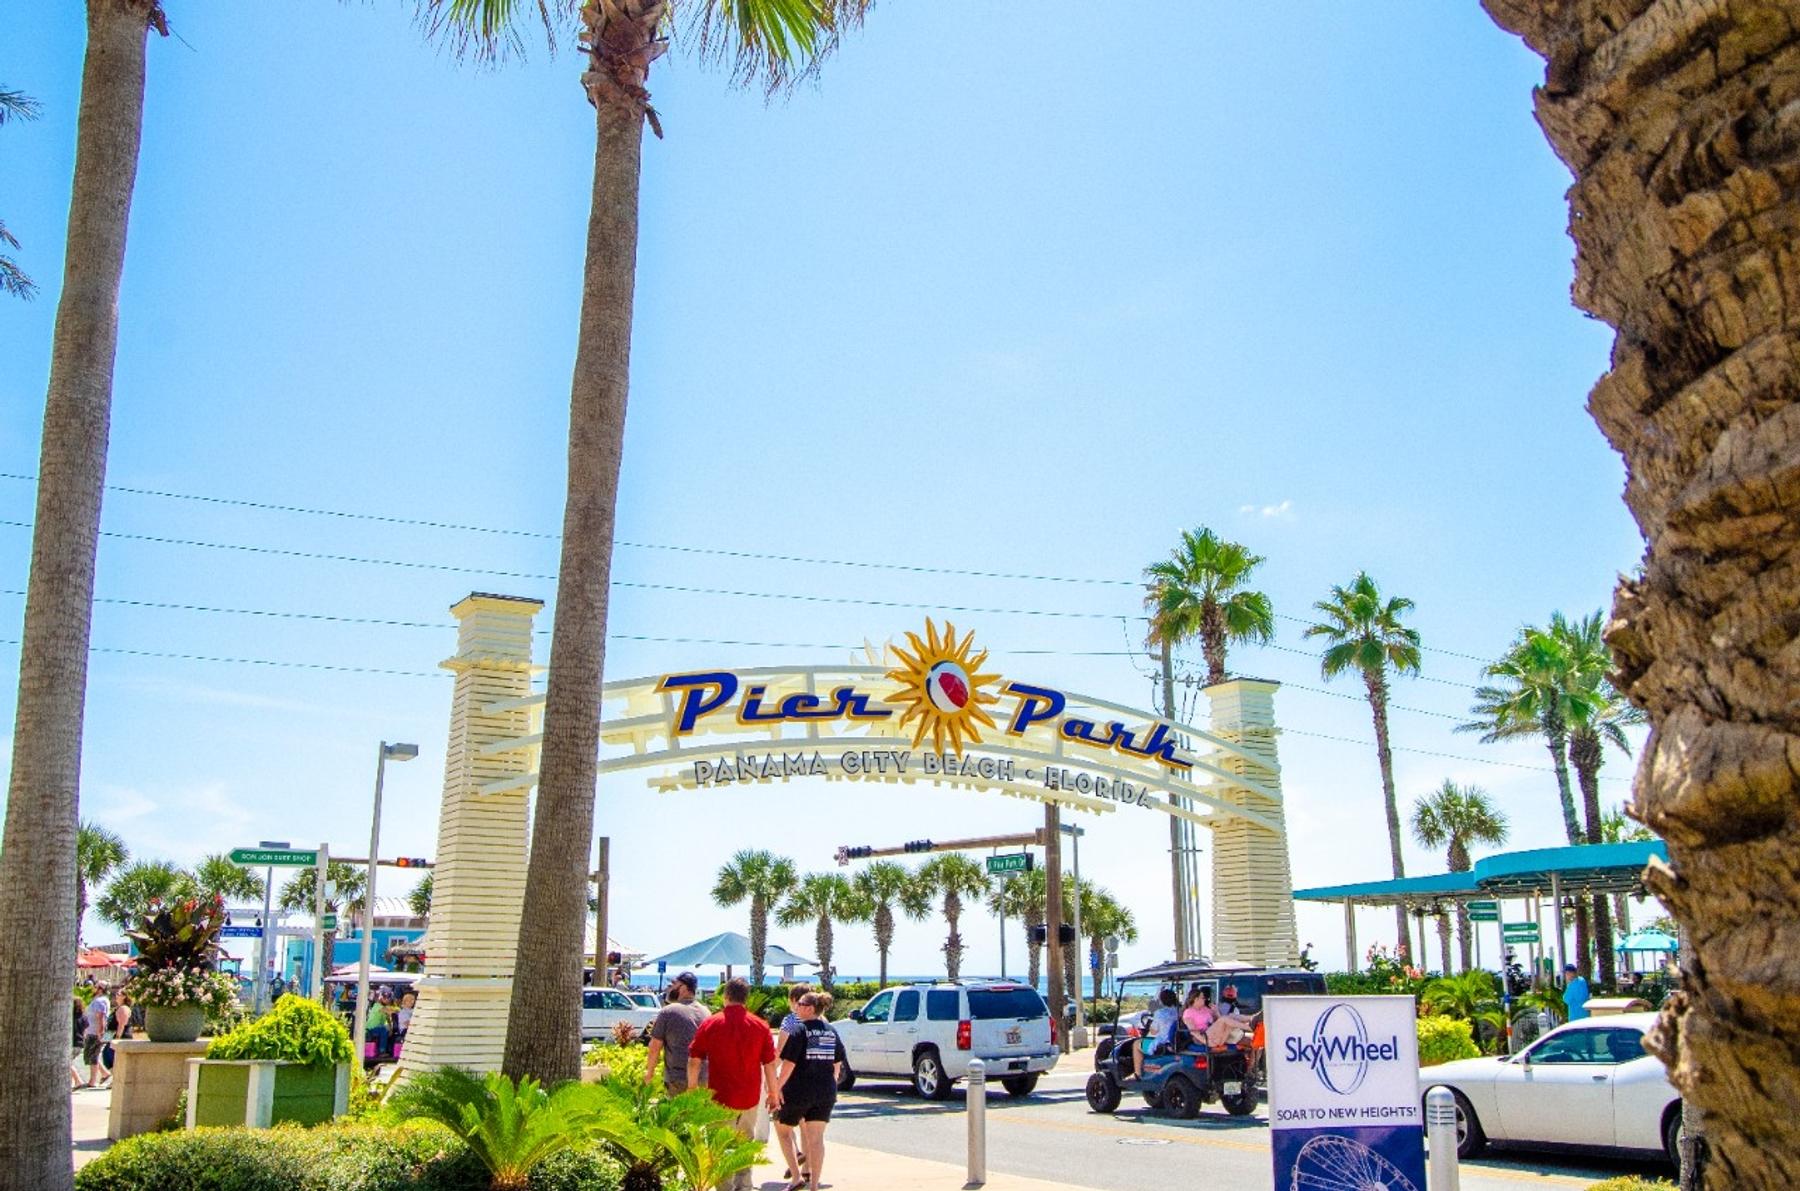 Pier Park Panama City Beach Entry